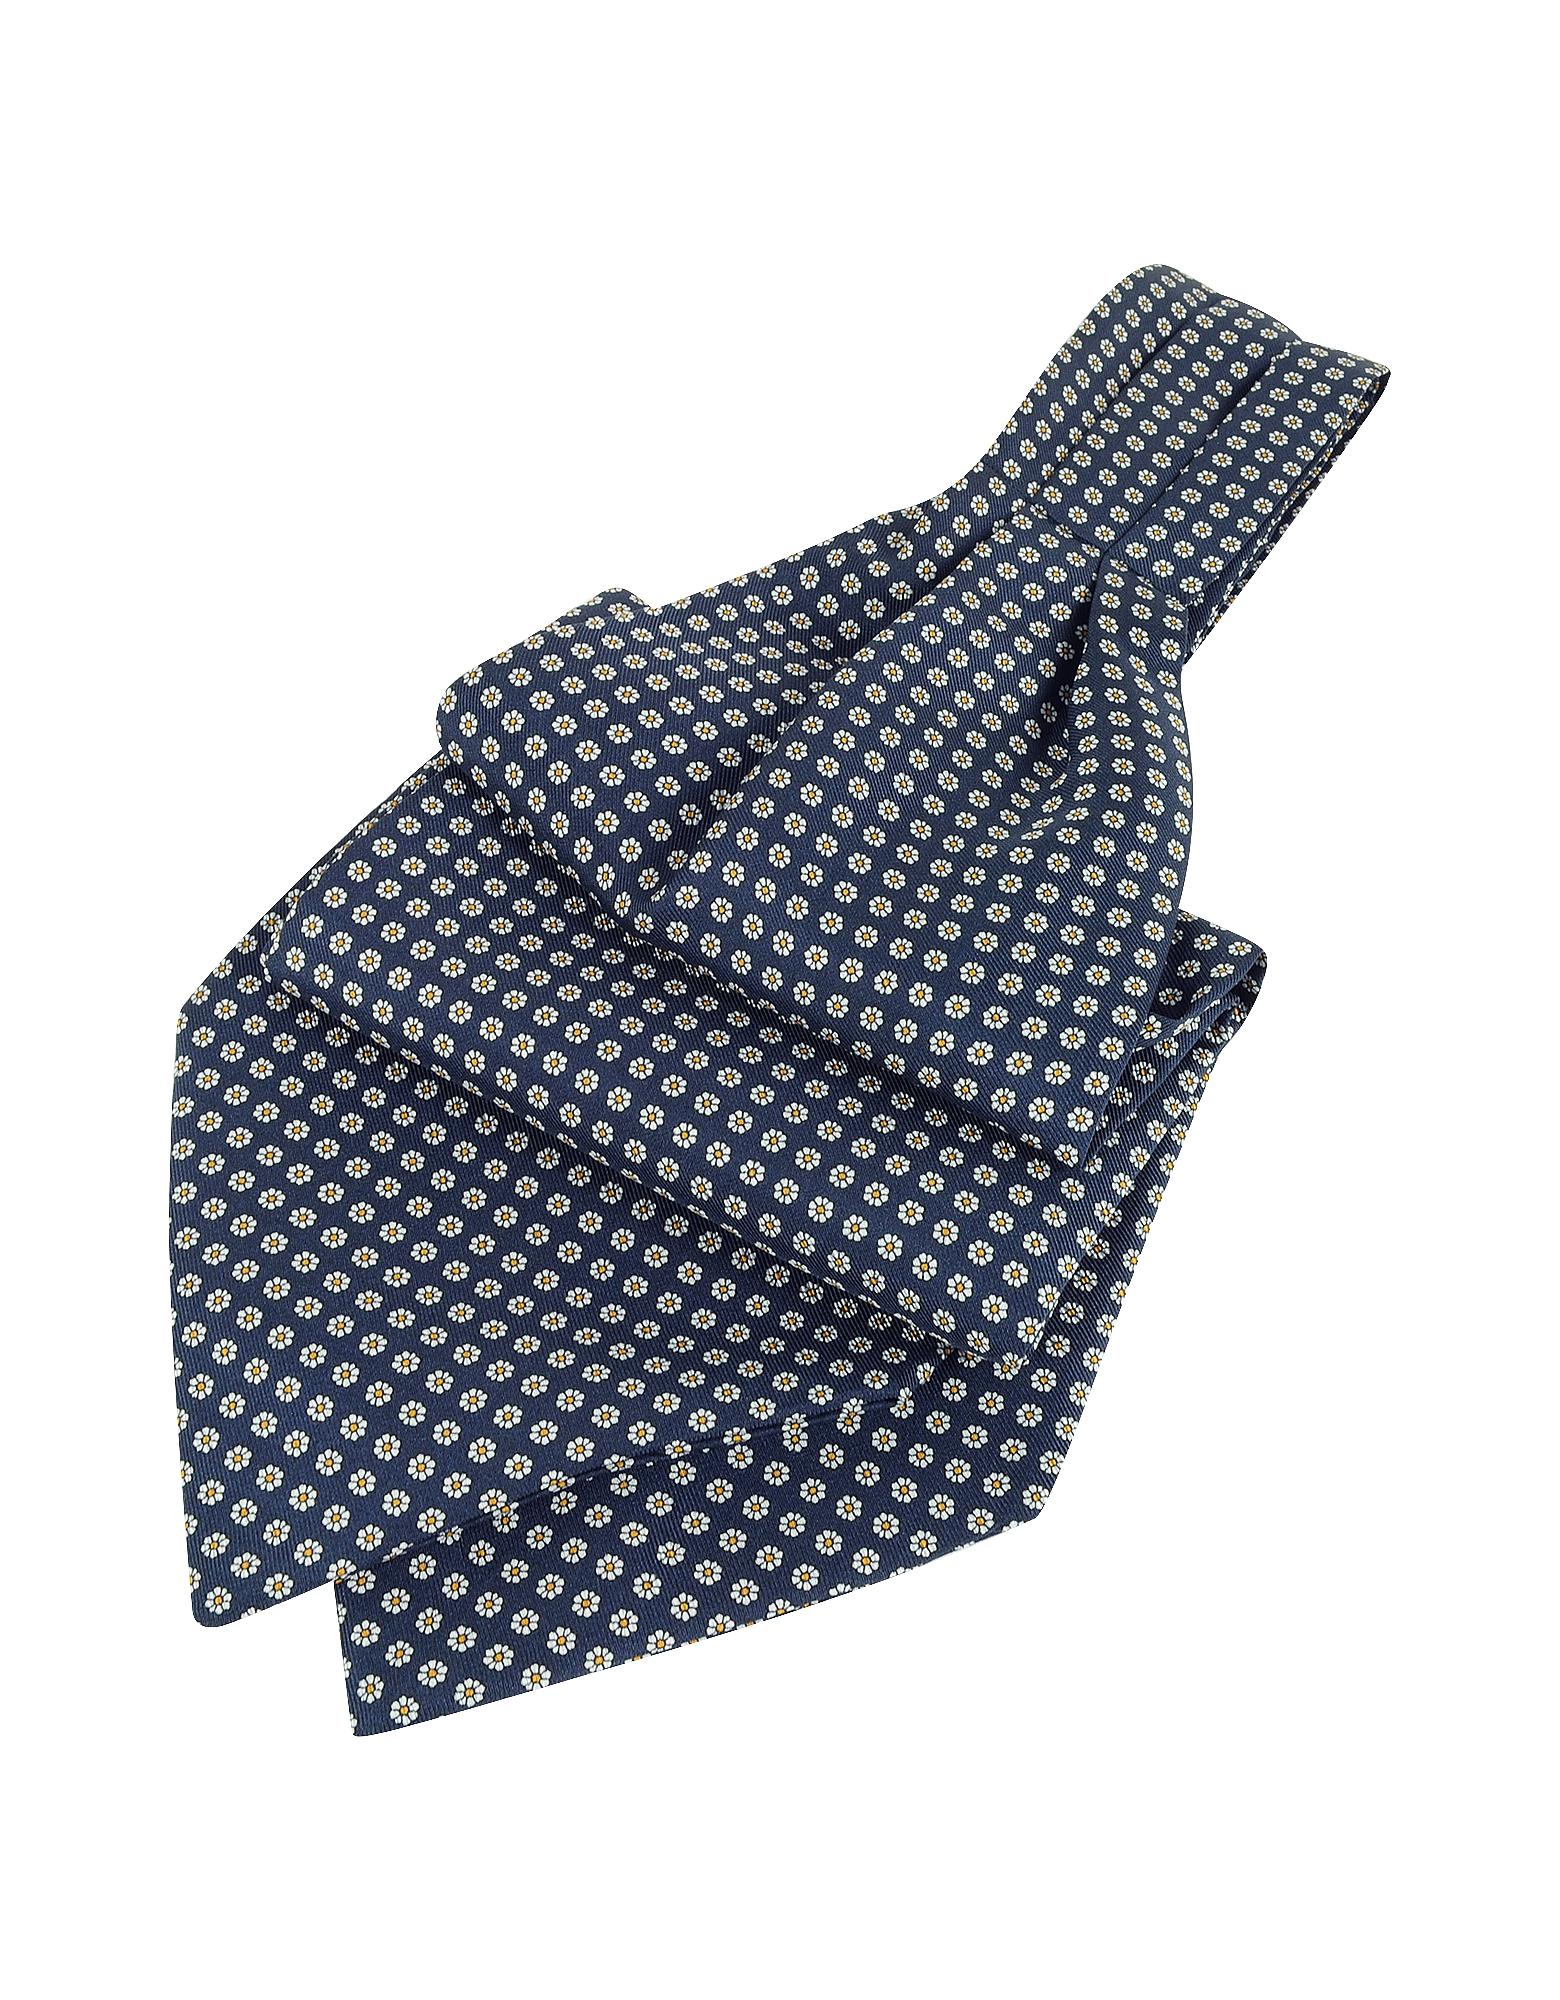 Image of Forzieri Designer Ascot ties, Daisy Print Pure Silk Ascot